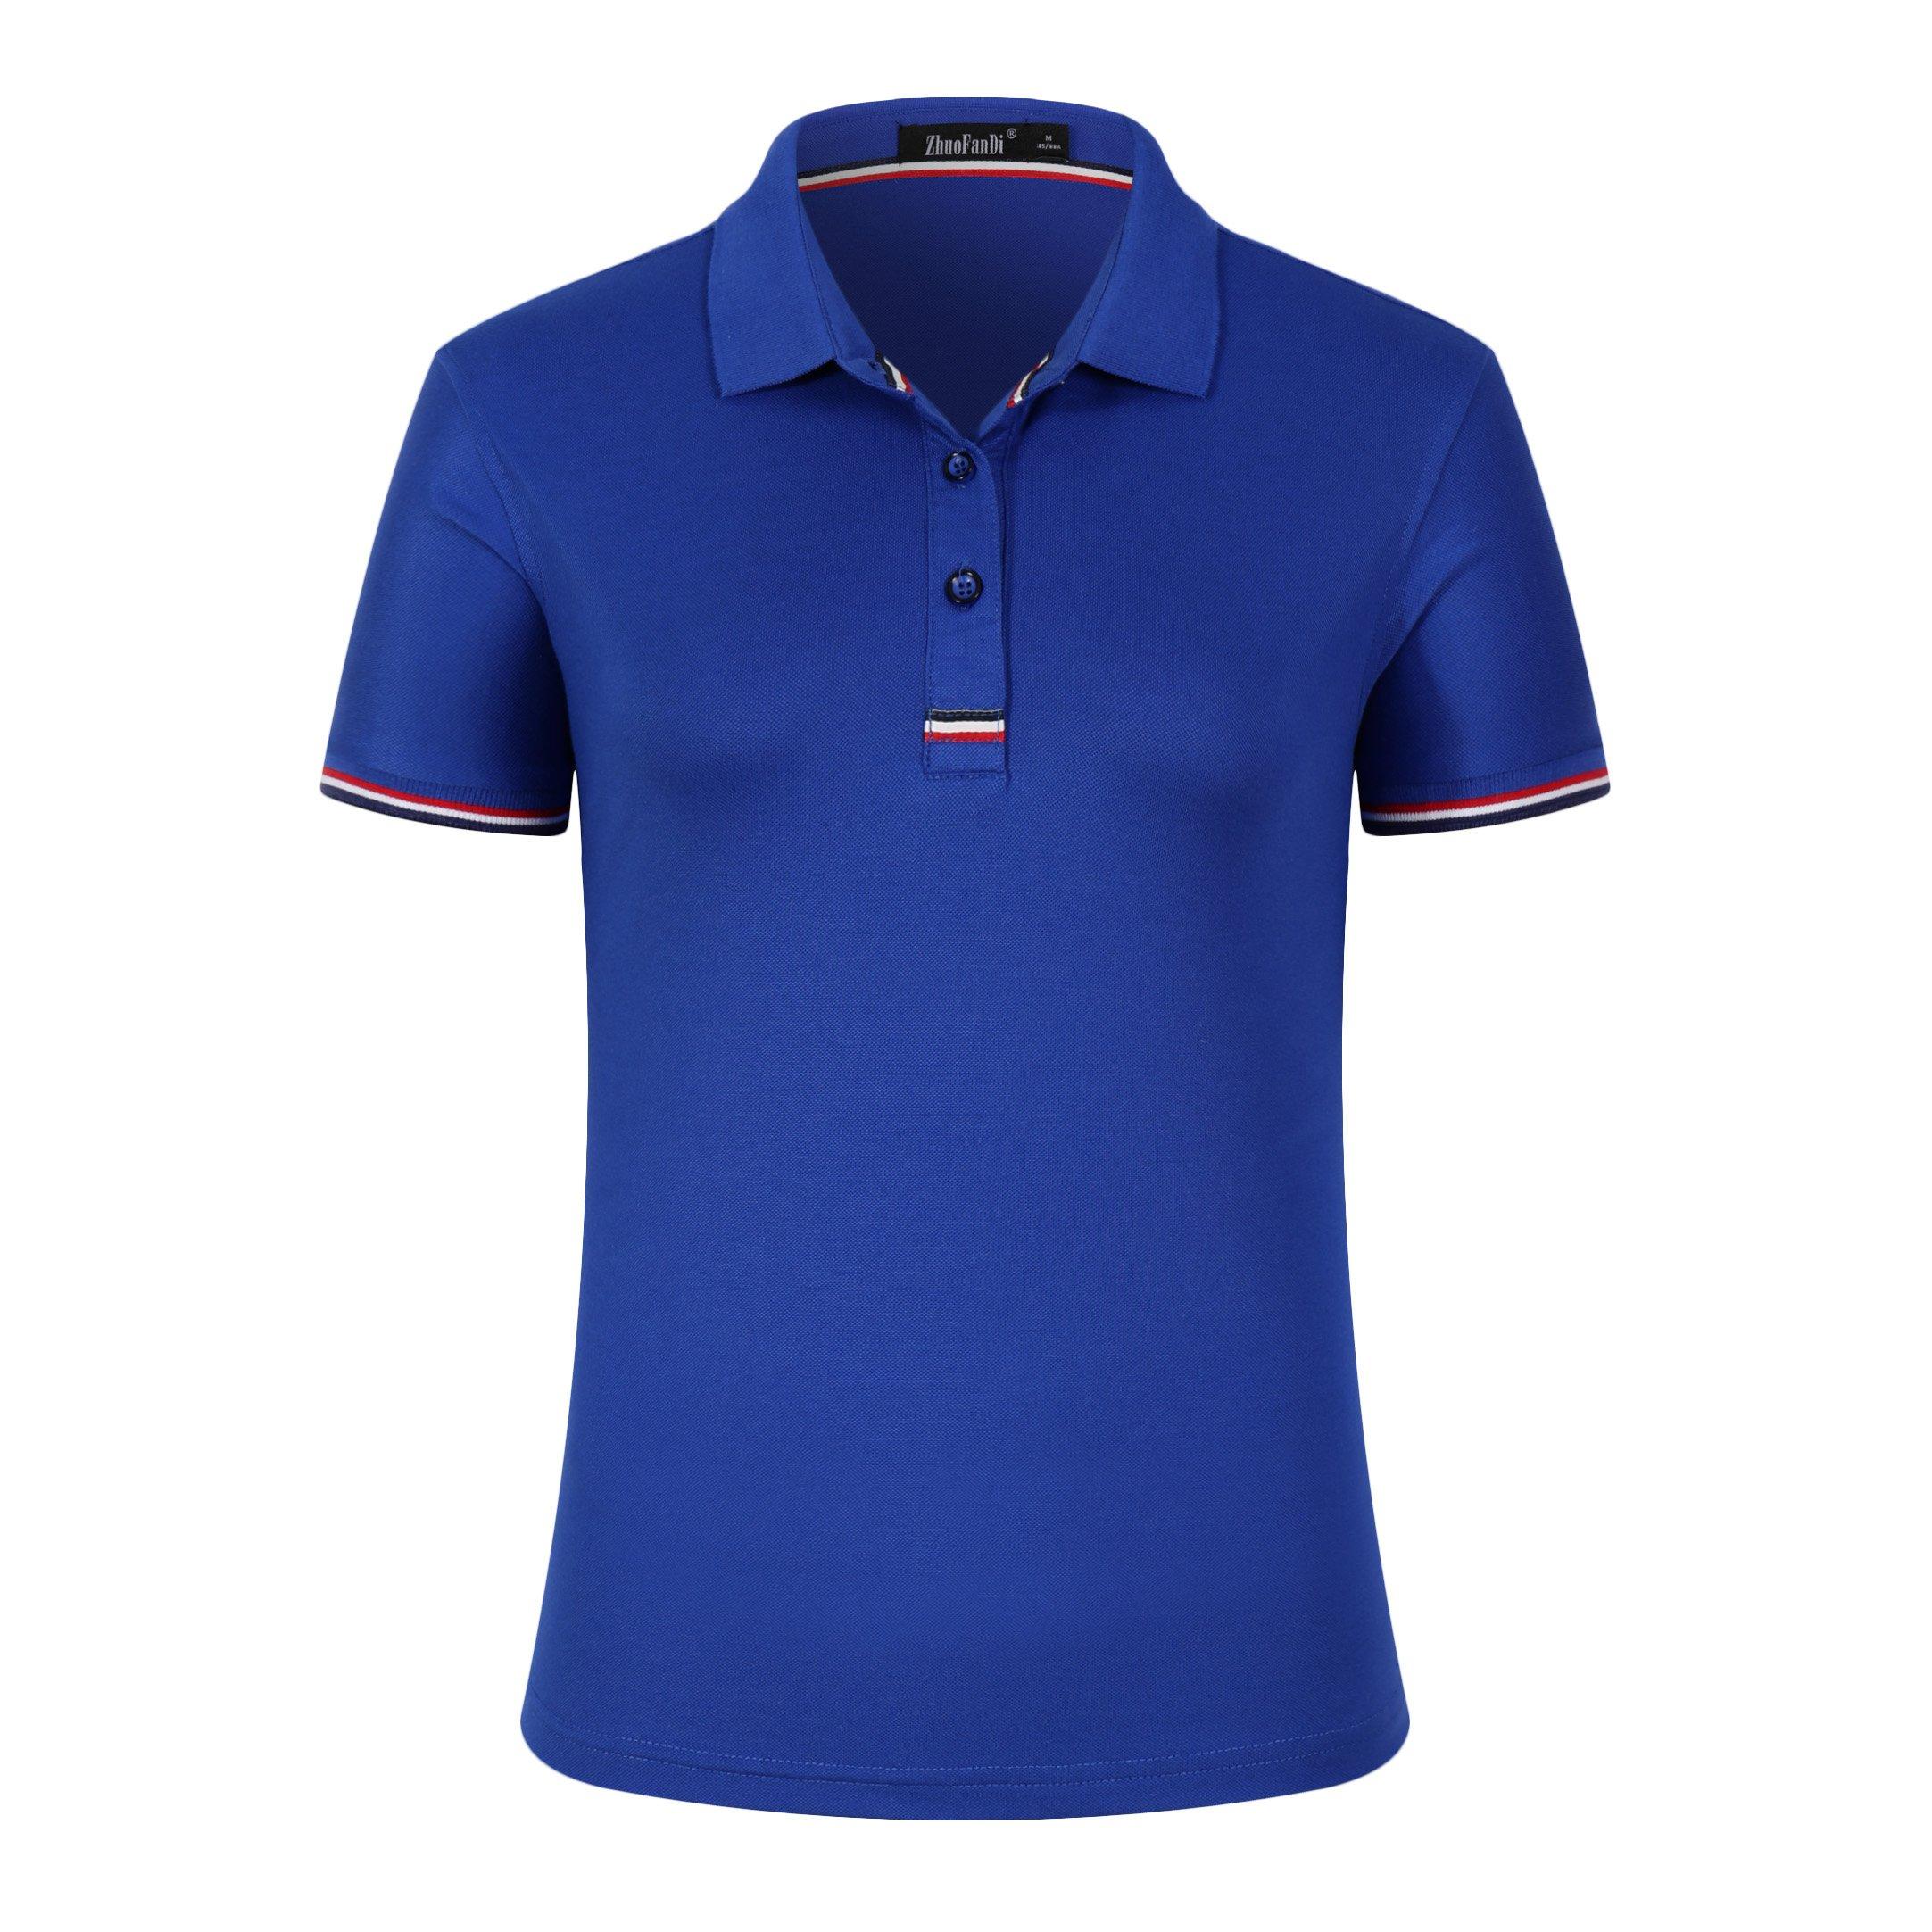 Mitario Femiego Women Classic Rainbow Collar Slim Fit Short Golf Polo Shirt Royal Blue S